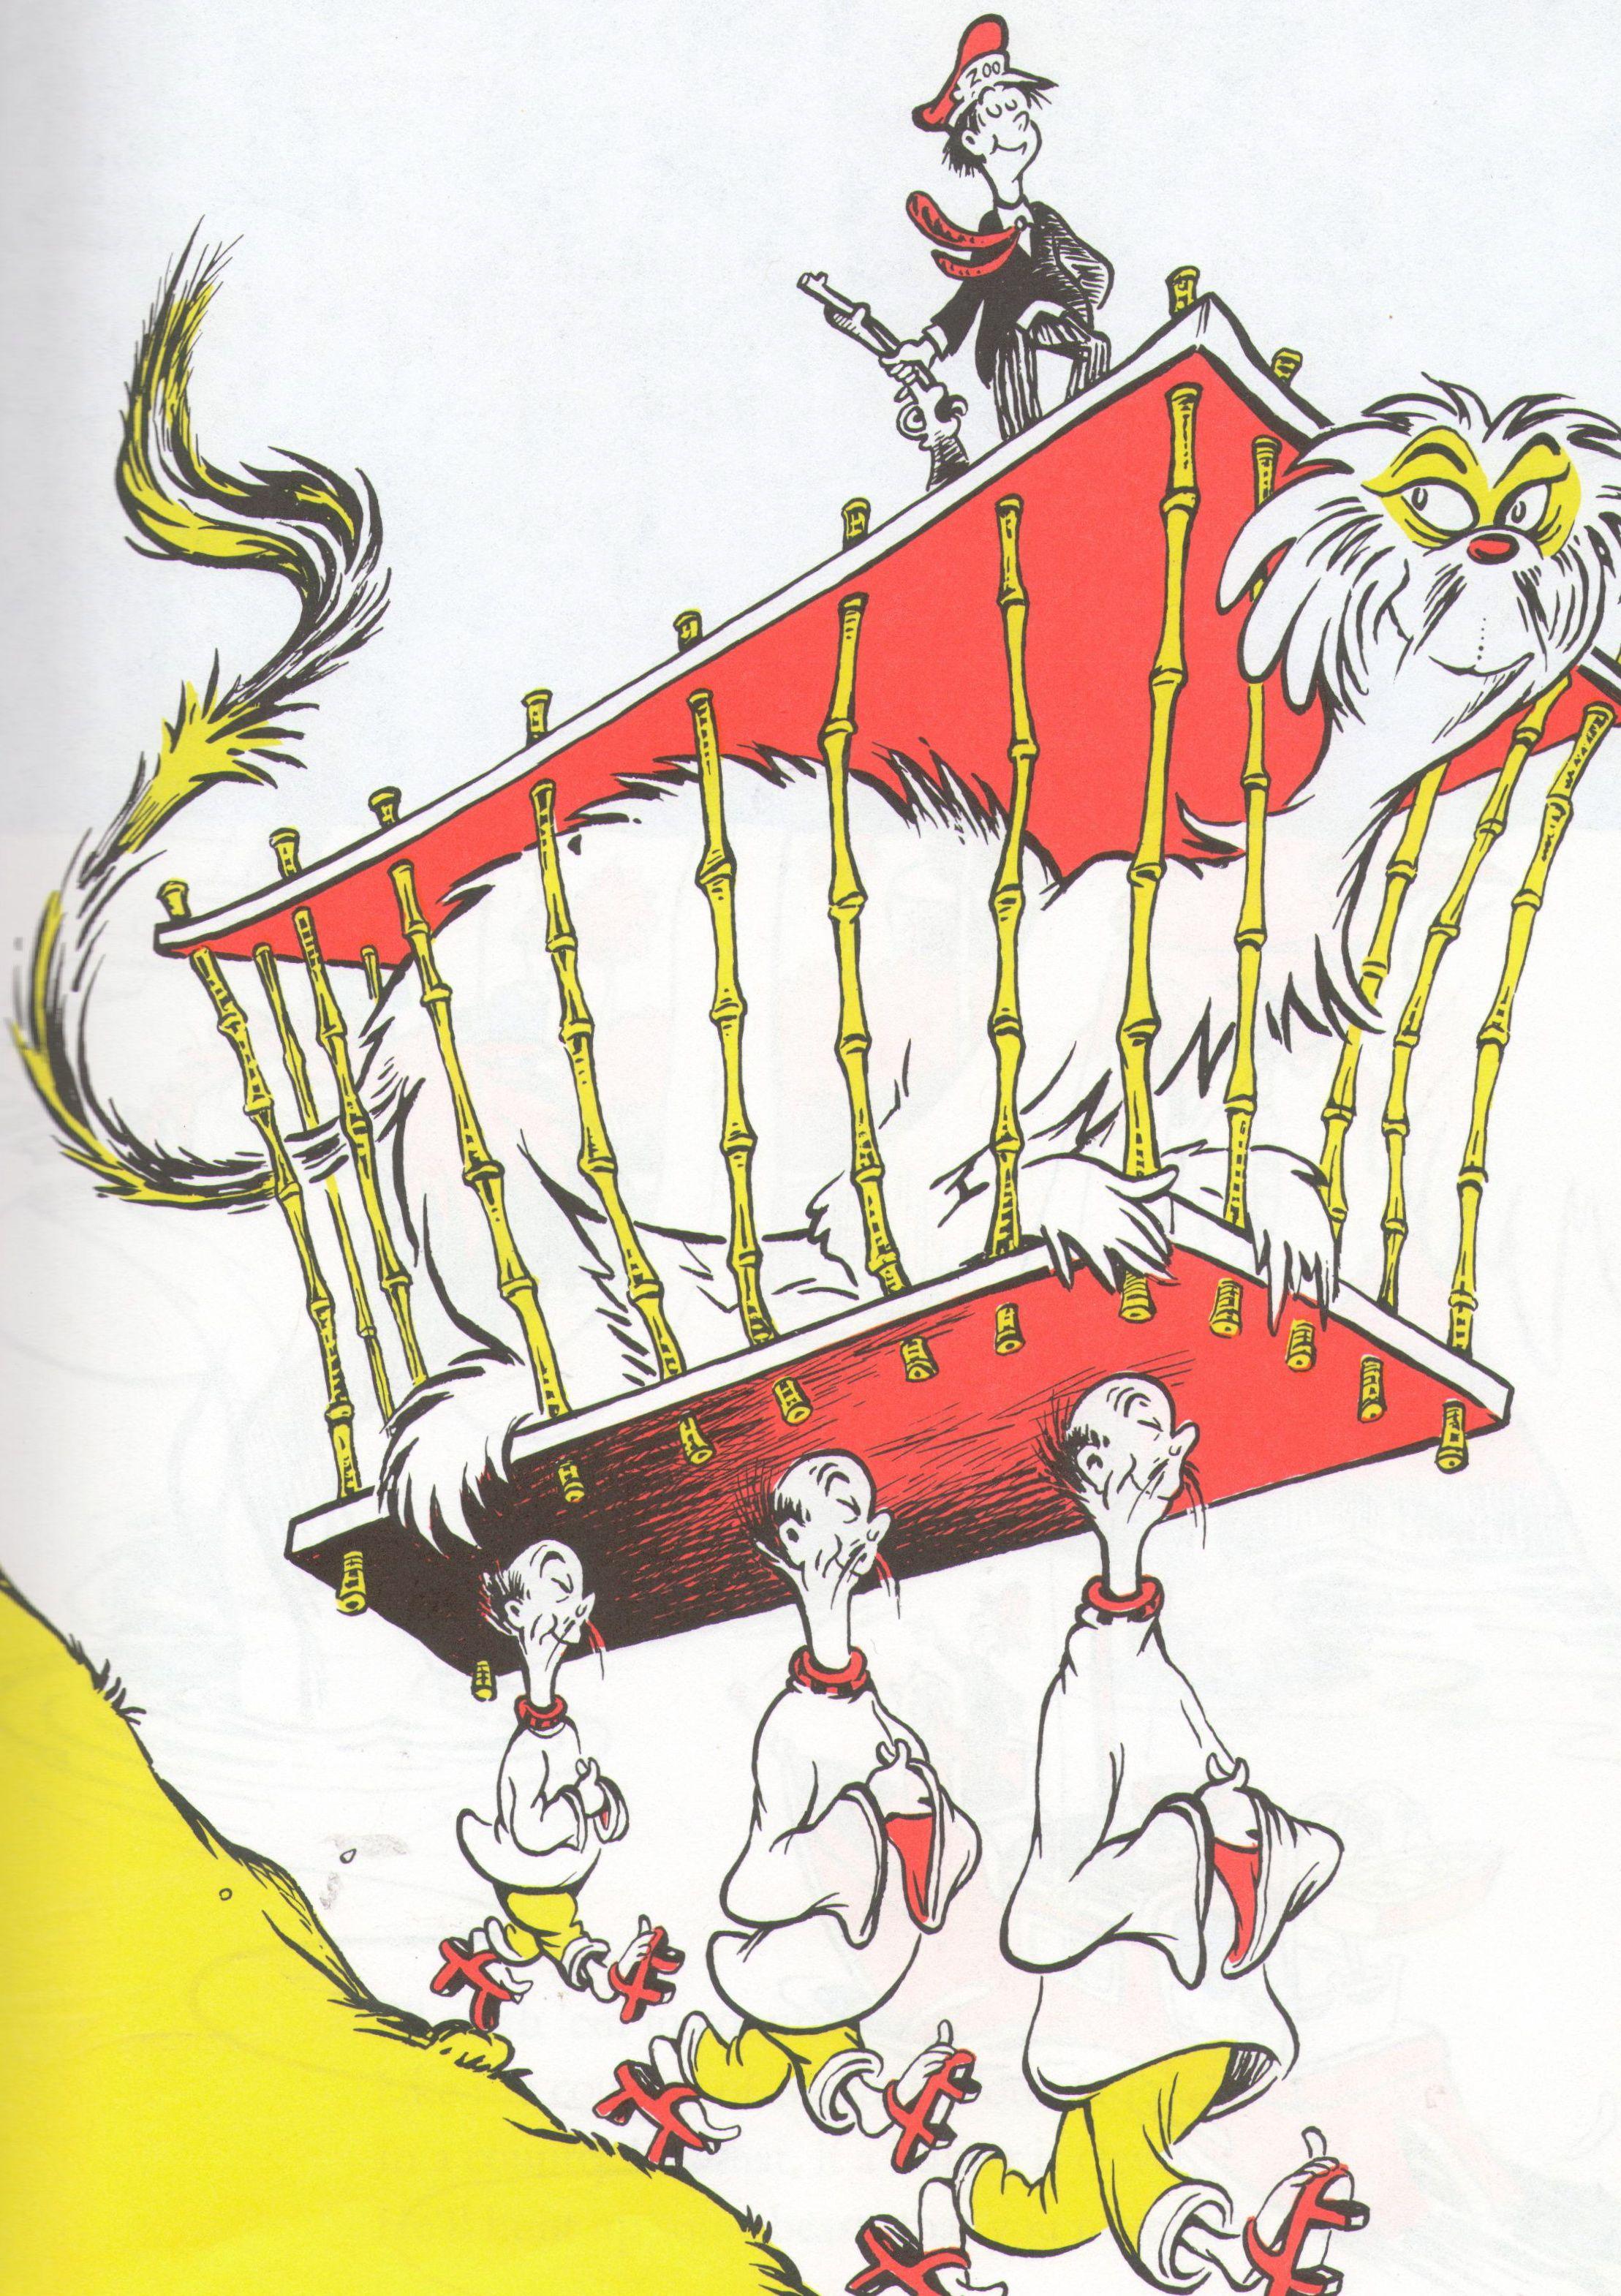 2217x3140 Dr. Seuss, Theodor Seuss Geisel, Illustrations, Drawings